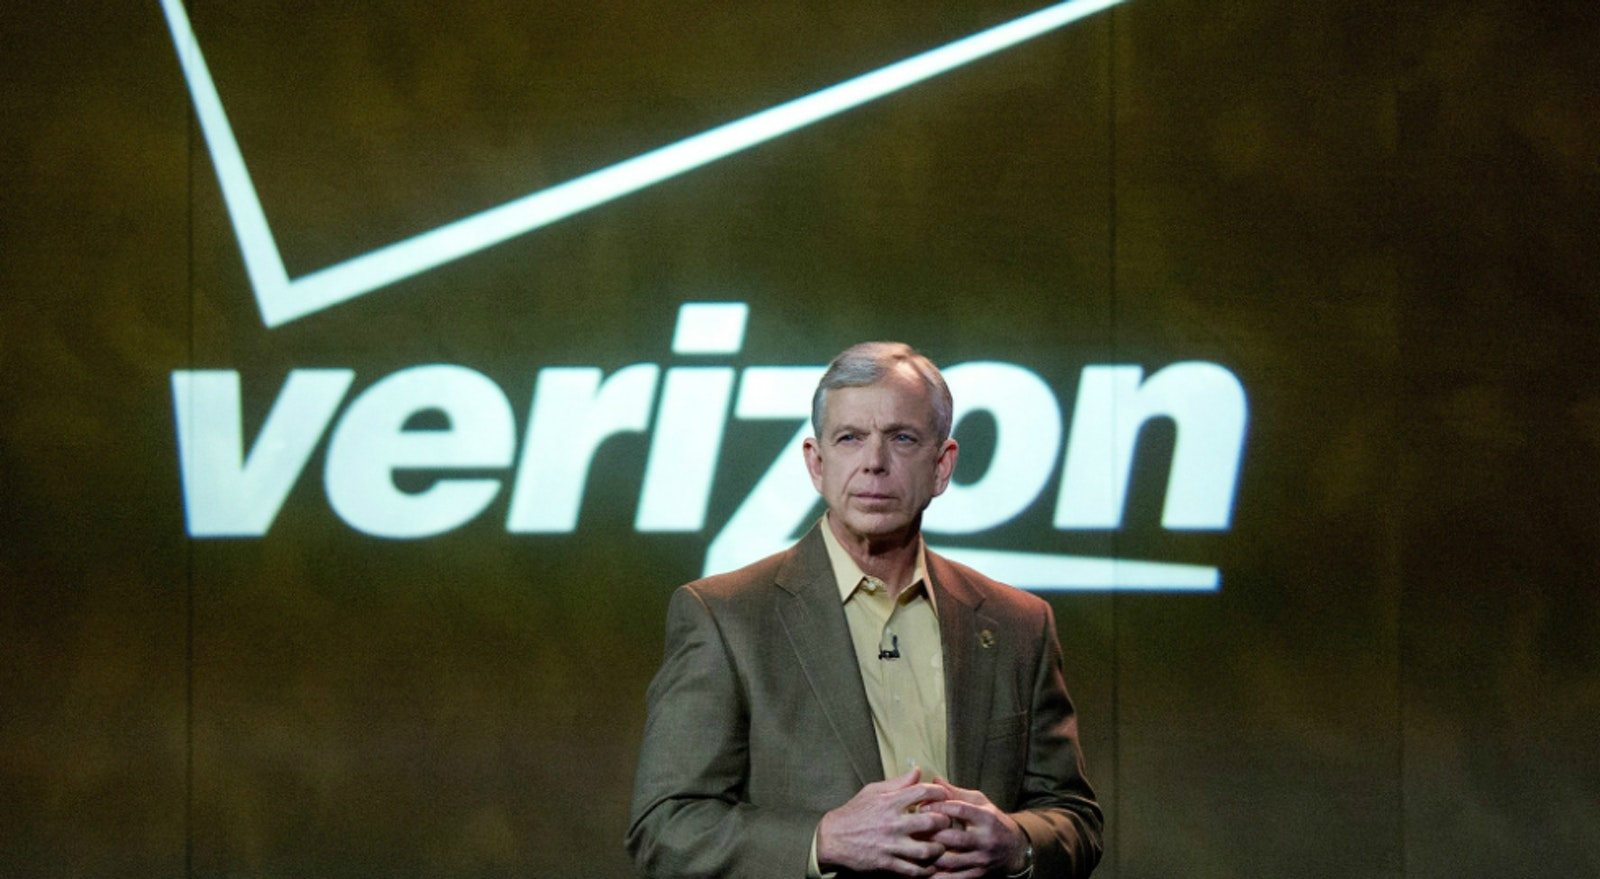 Verizon Communications CEO Lowell McAdam. Photo by Bloomberg.